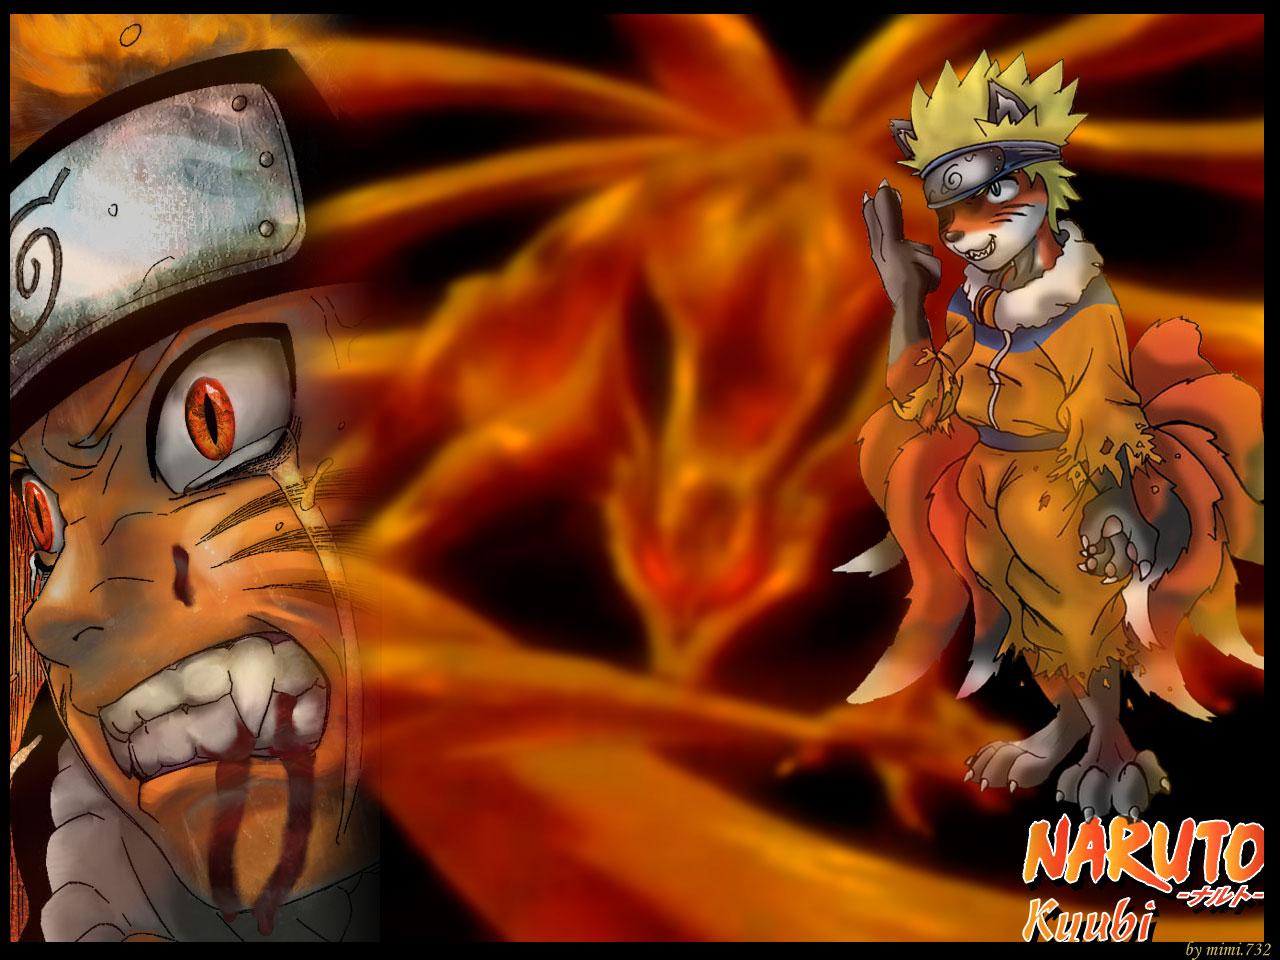 Galleria - Naruto renard ...